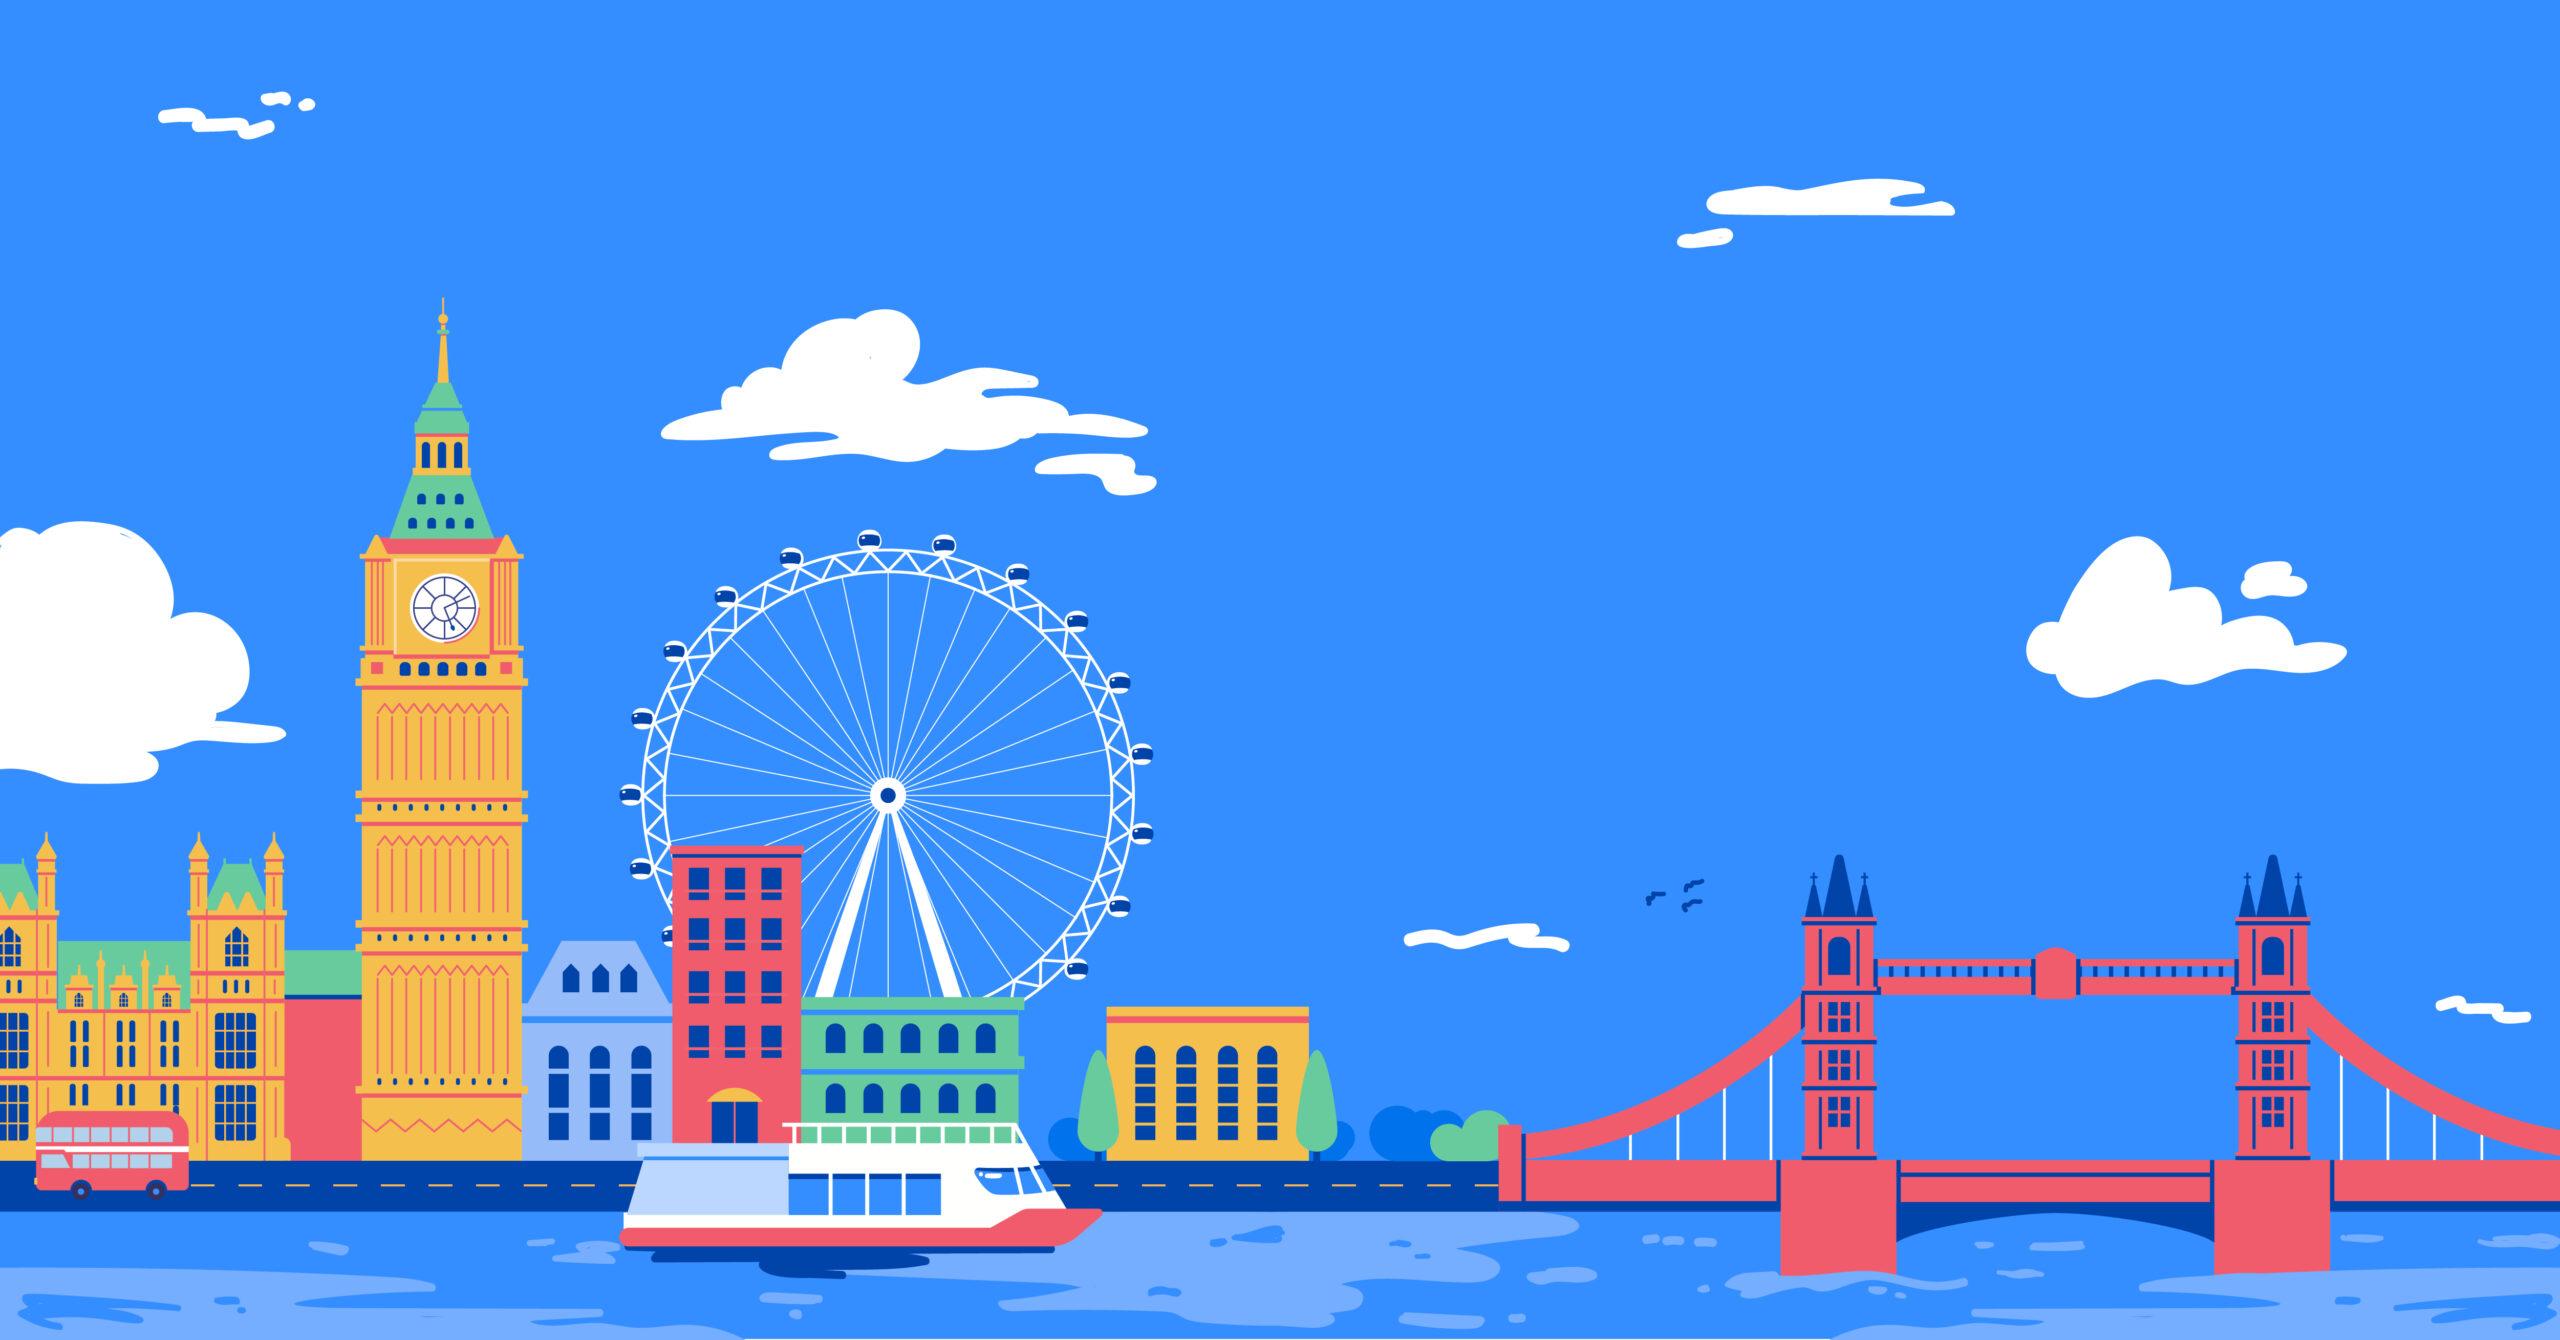 Illustration of London landmarks